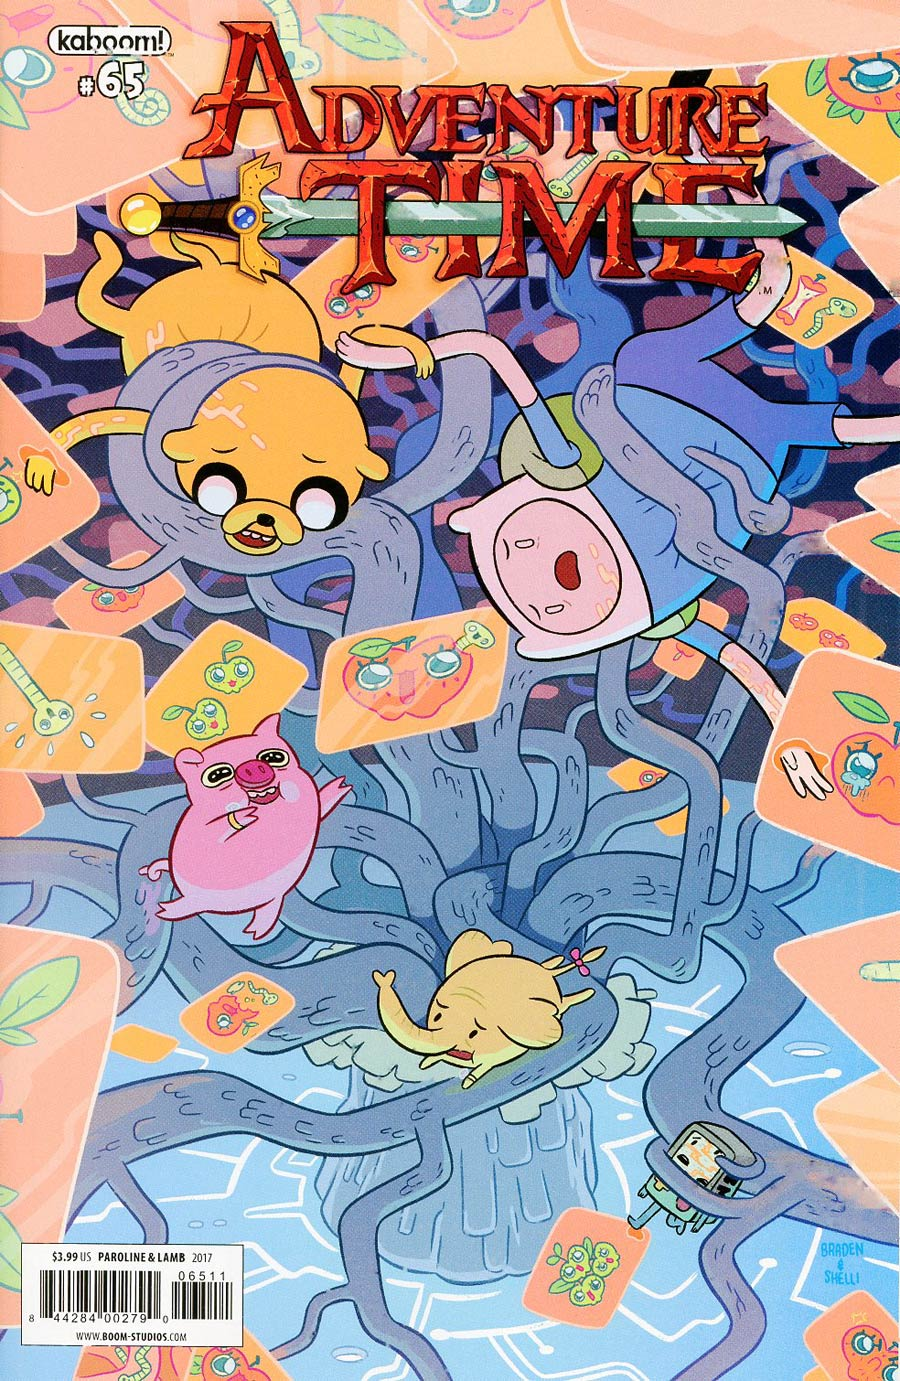 Adventure Time #65 Cover A Regular Shelli Paroline & Braden Lamb Cover